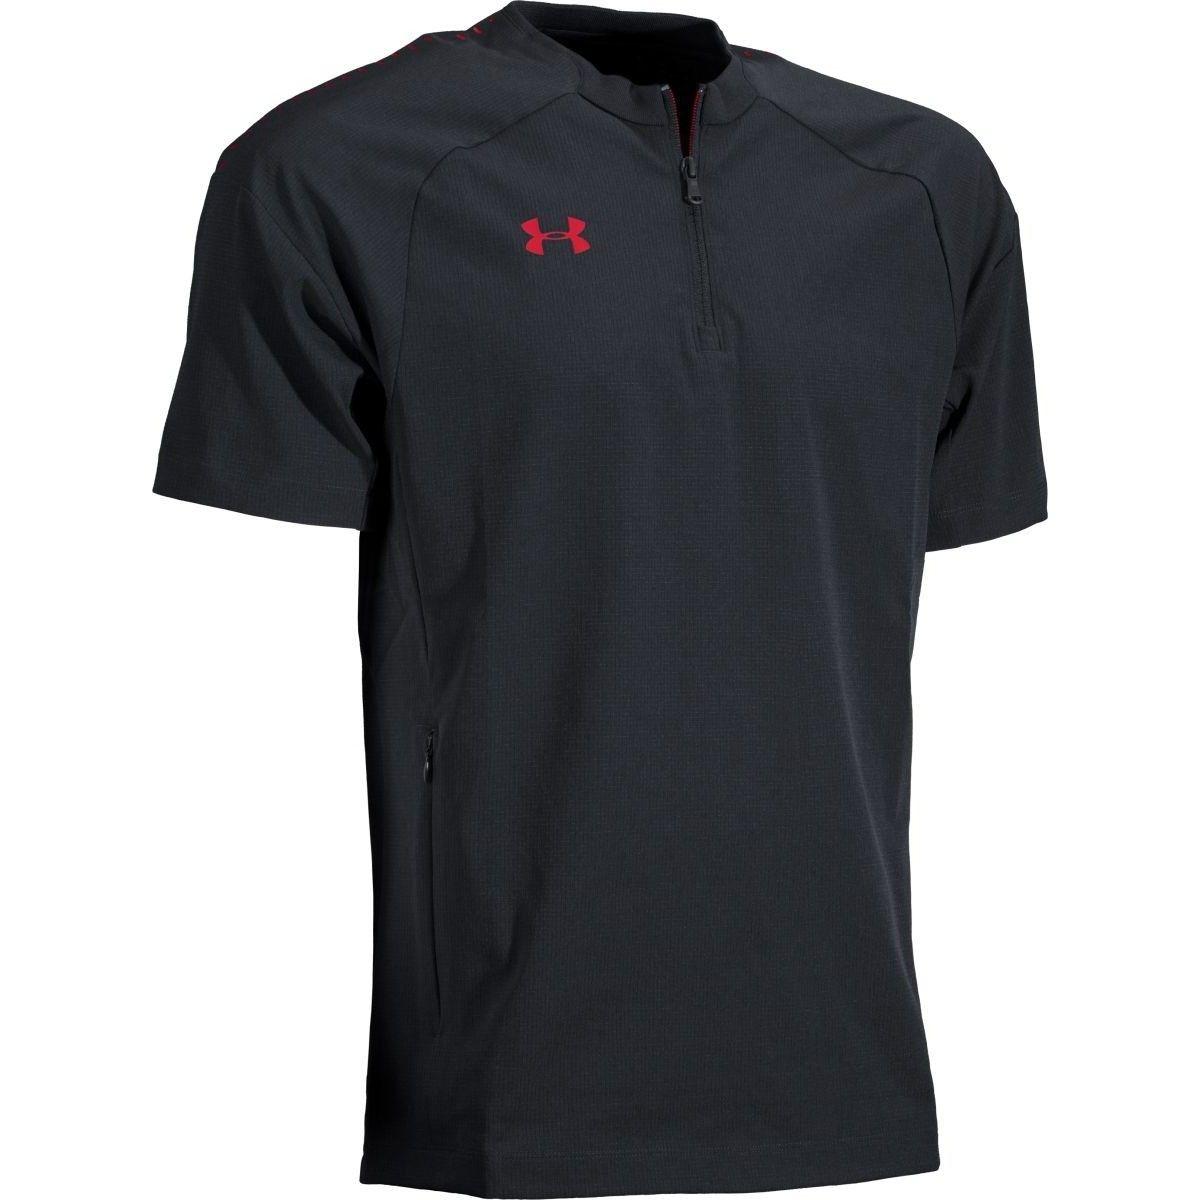 Under Armour NCAA Mens Storm-1 Hybrid Jacket